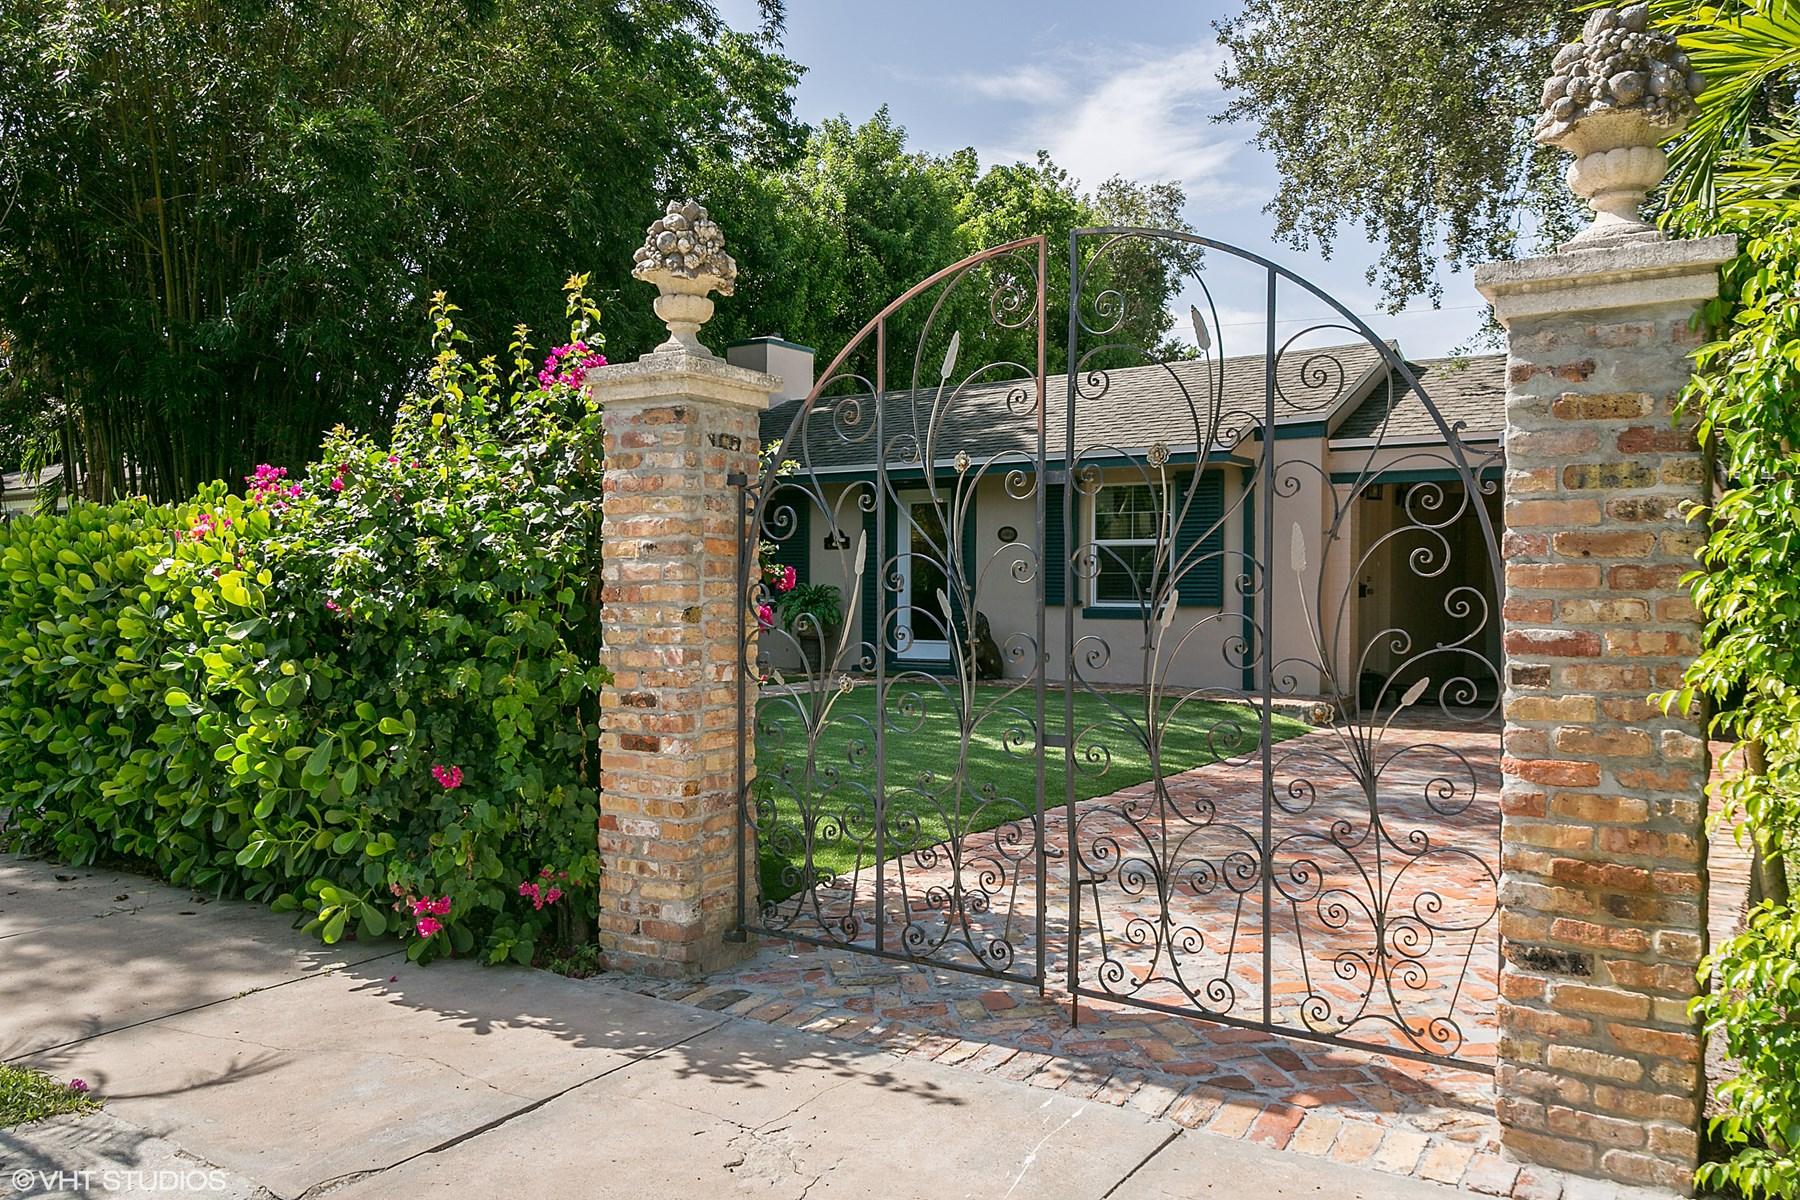 Villa per Vendita alle ore Historic El Cid Landmarked Jewel 322 Valencia Rd West Palm Beach, Florida, 33401 Stati Uniti